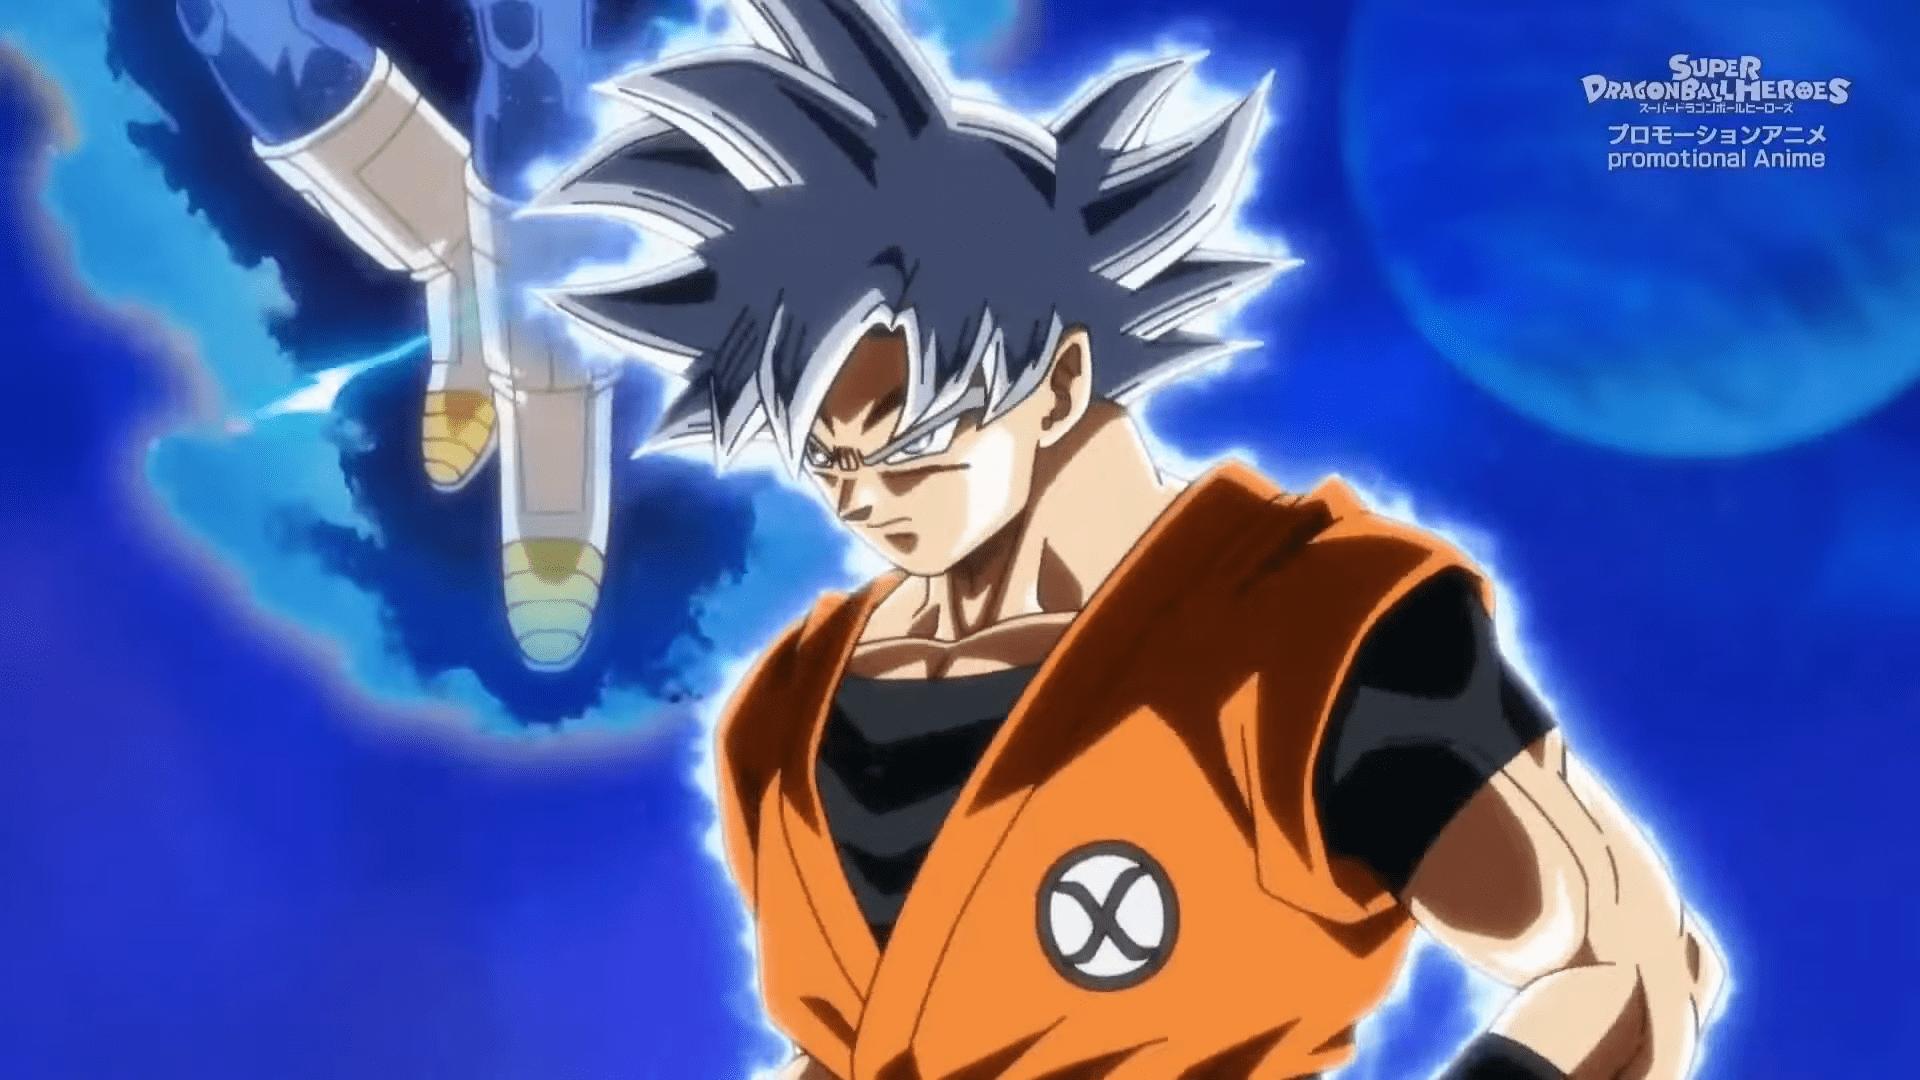 Most Popular Anime that deserve a new season - Dragon Ball Super